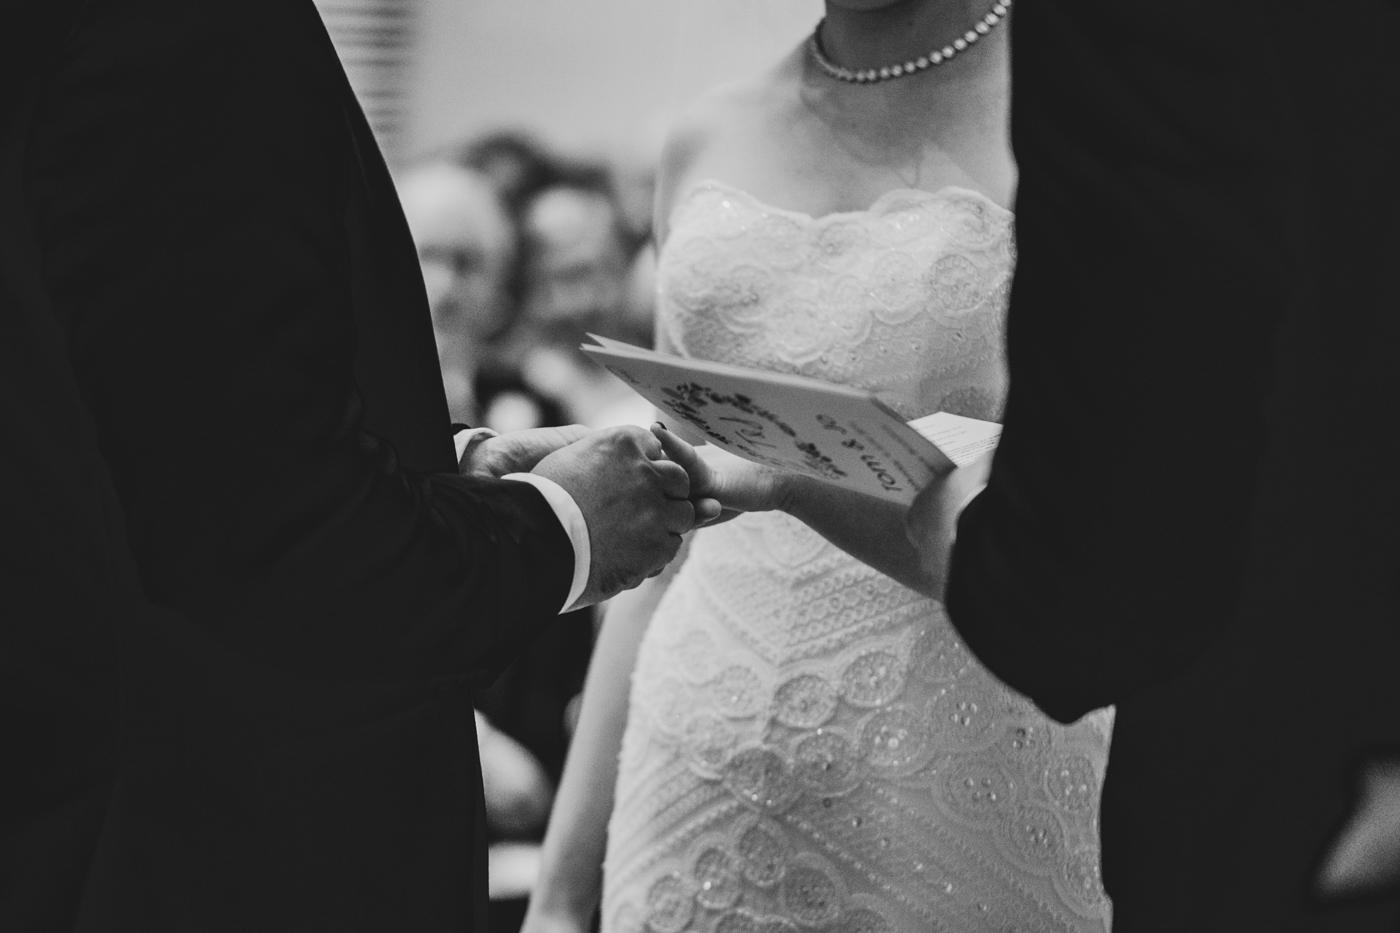 Jo & Tom Wedding - The Grounds of Alexandria - Samantha Heather Photography-119.jpg